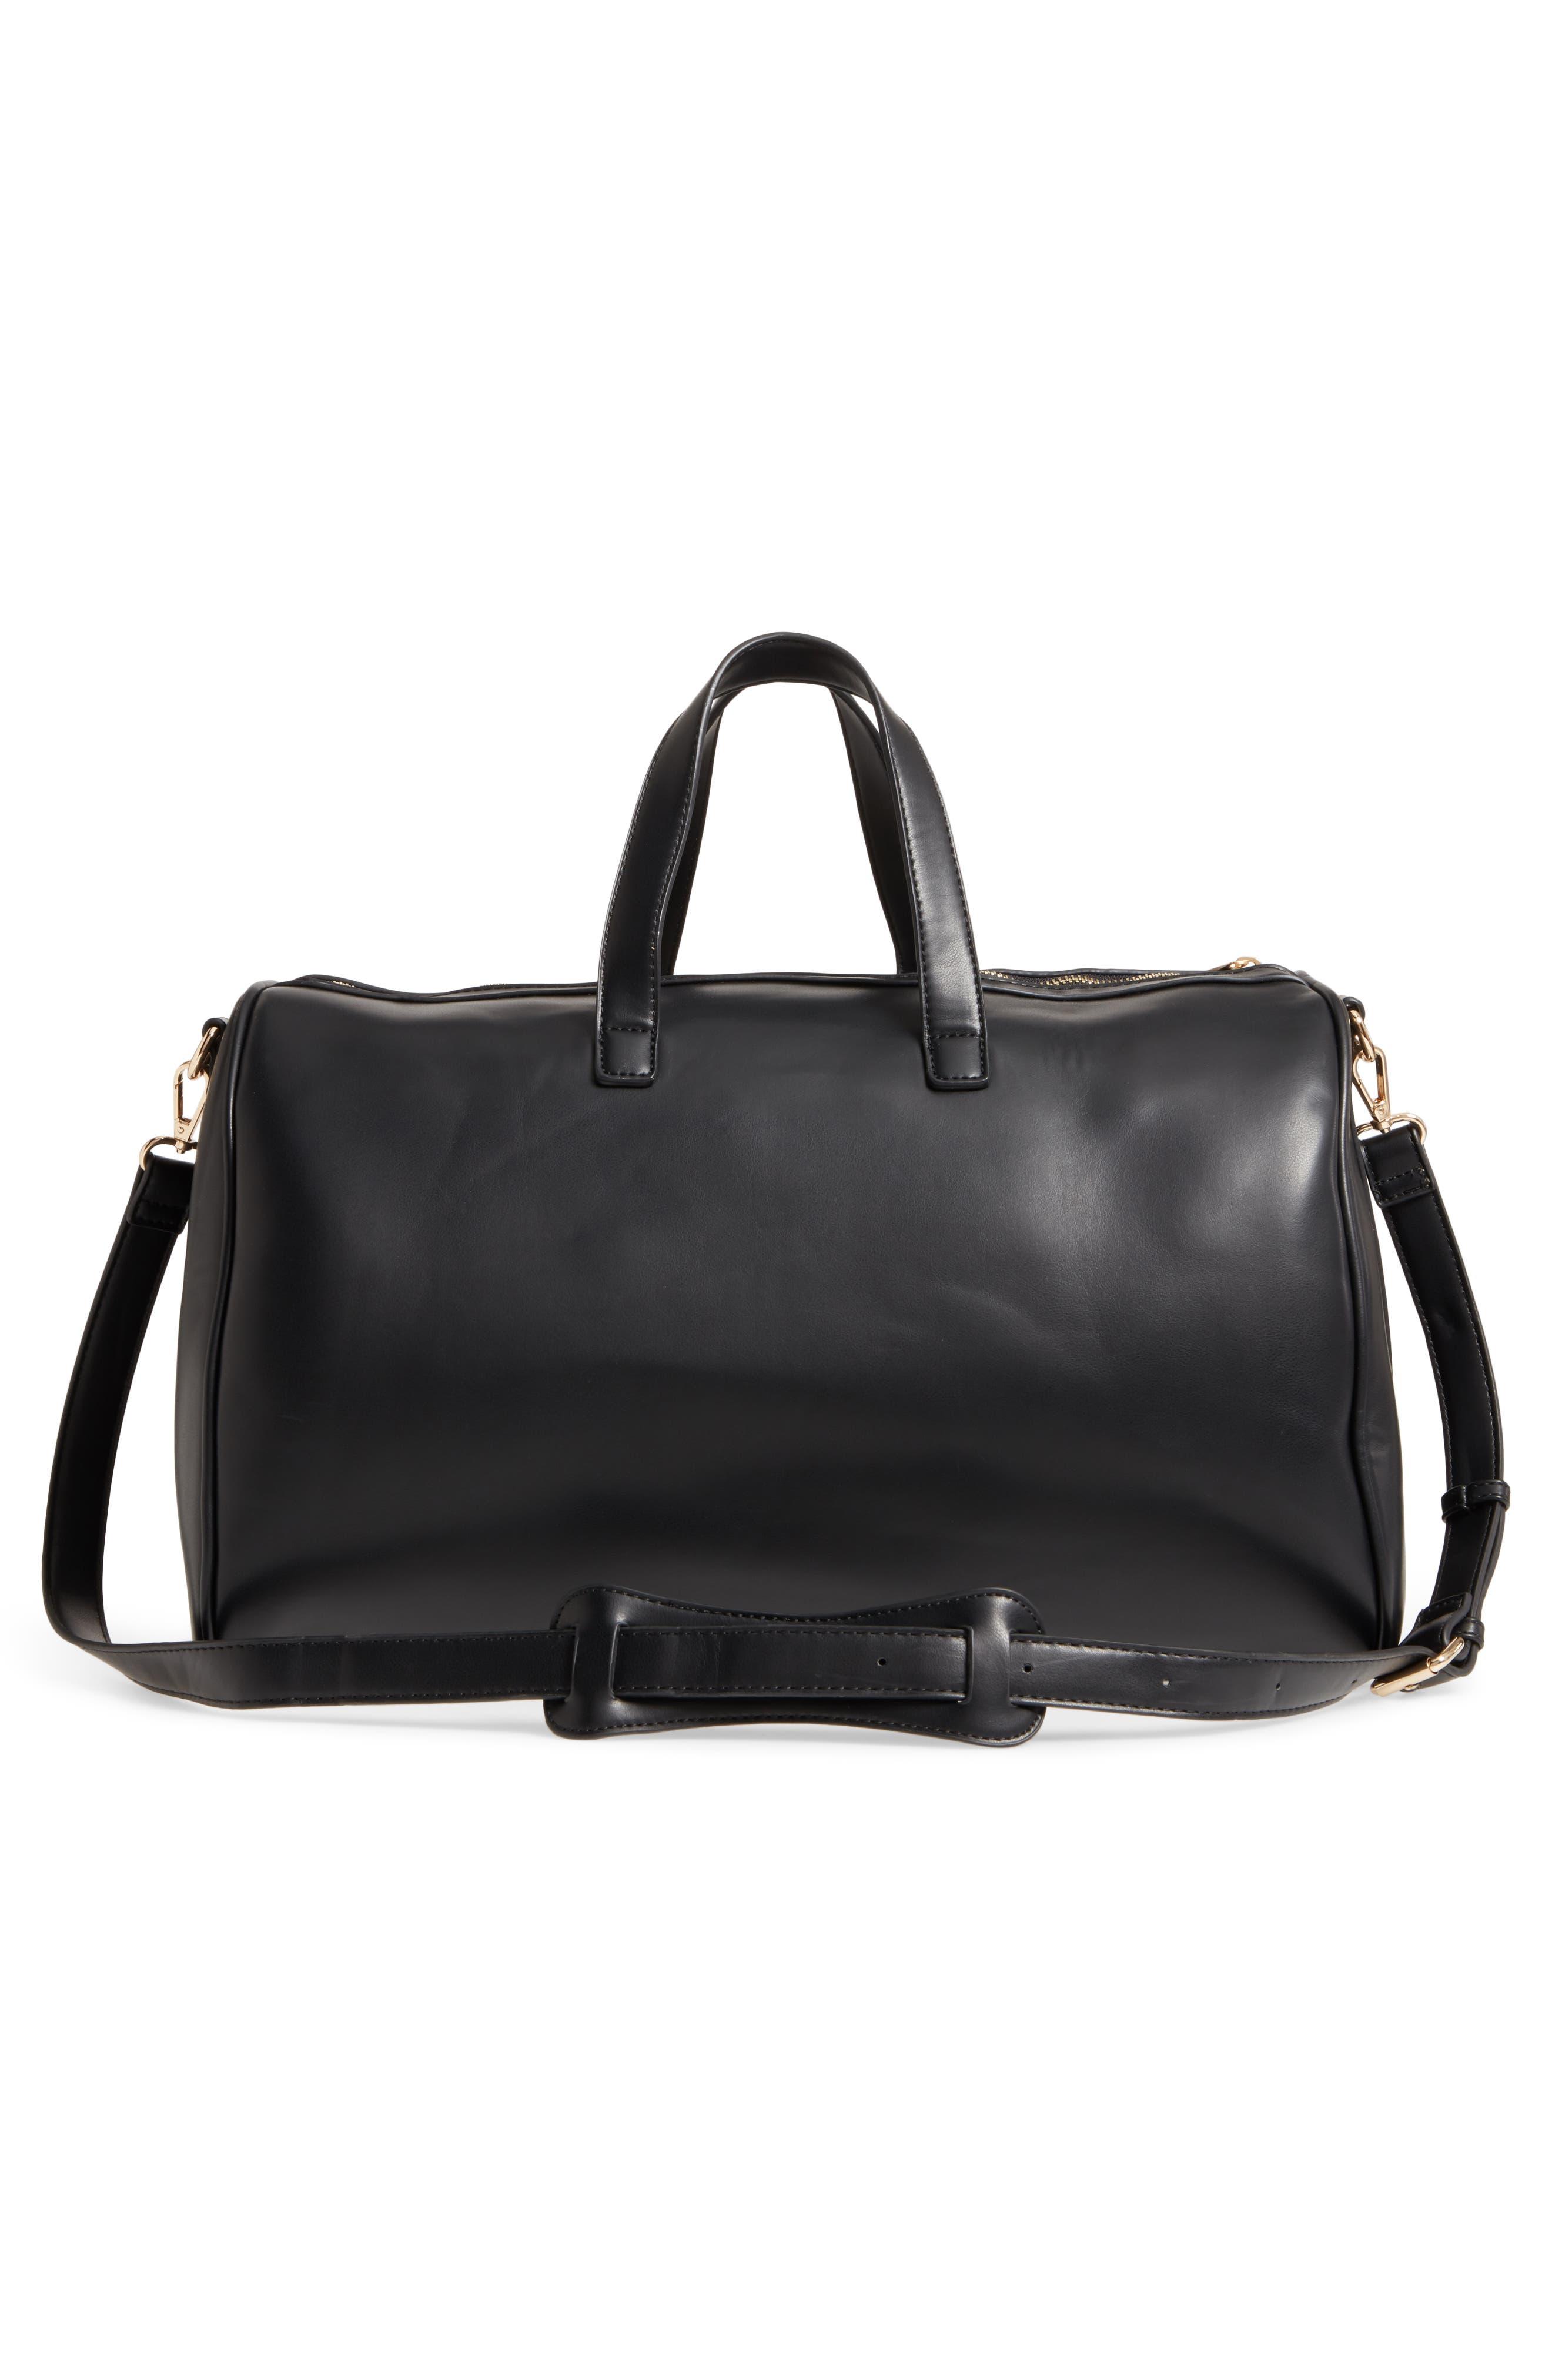 Stripe Faux Leather Duffel Bag,                             Alternate thumbnail 3, color,                             001